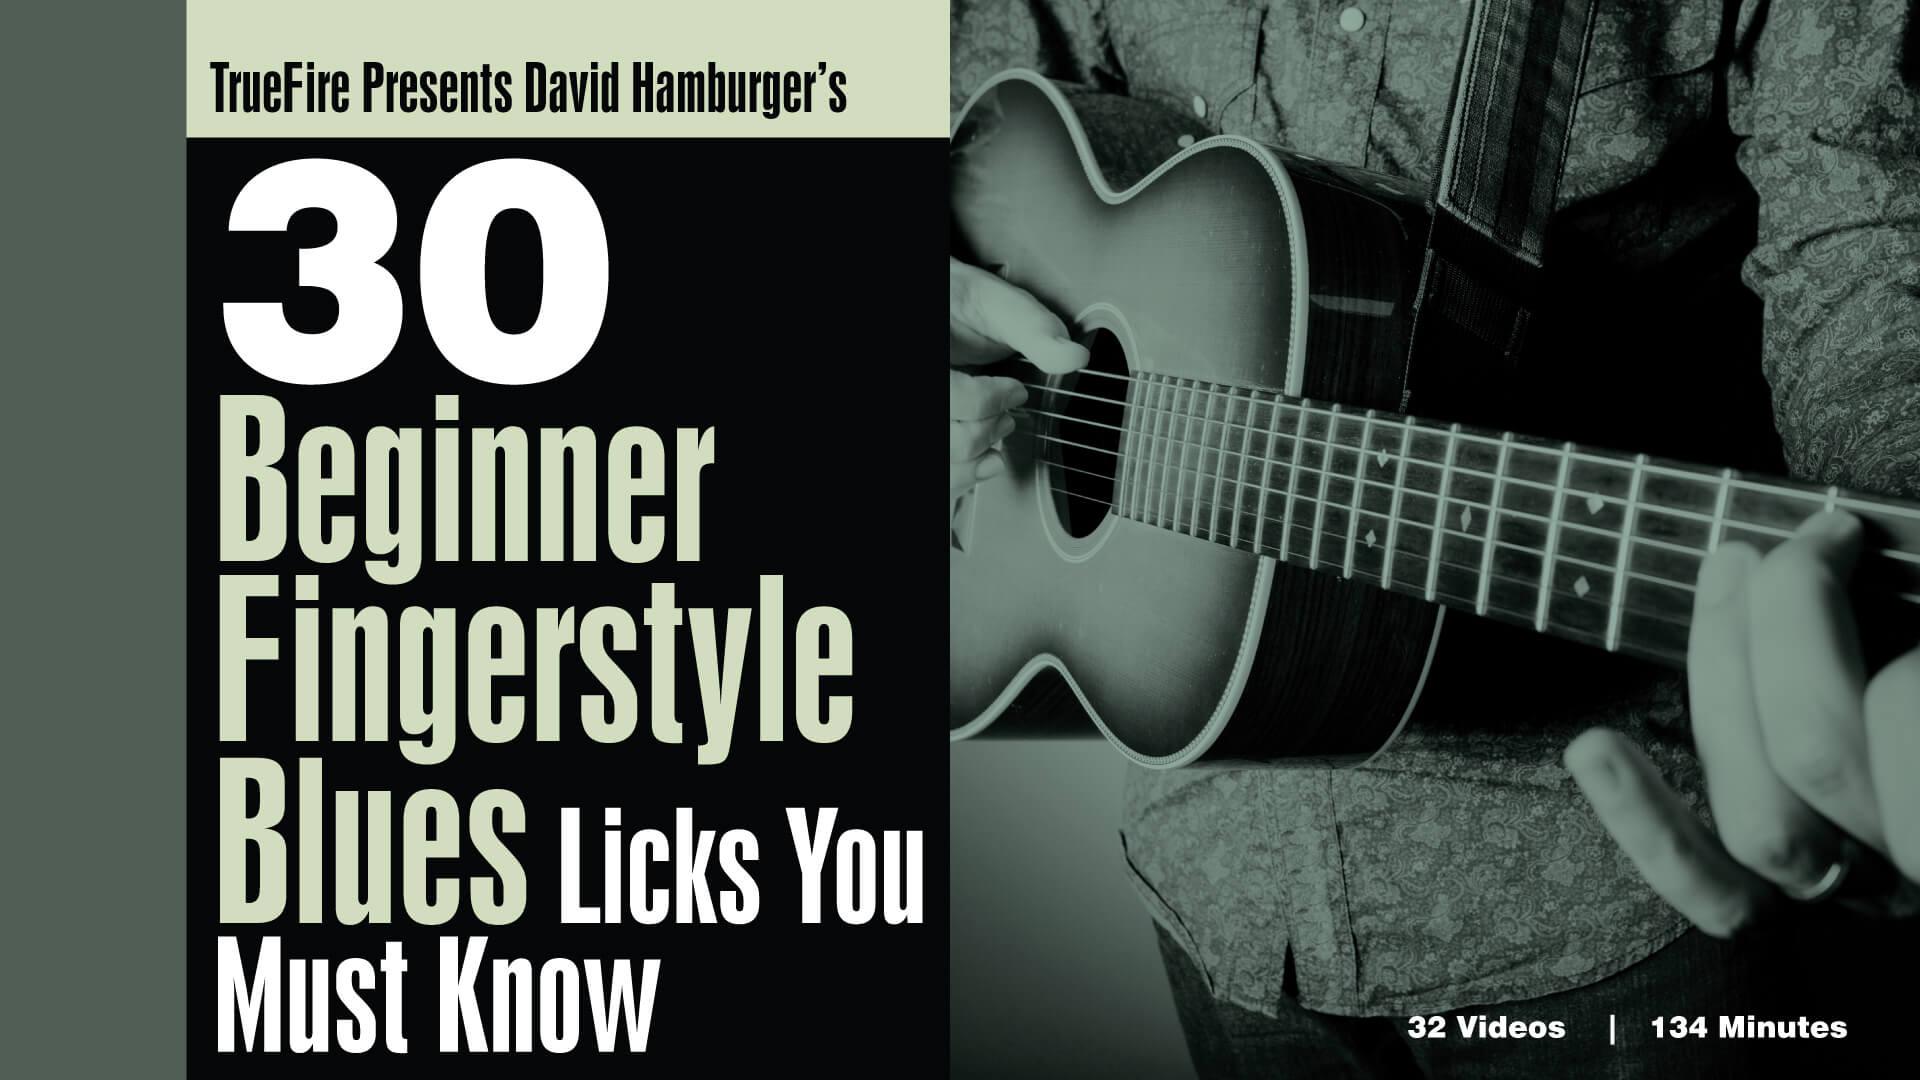 30 Beginner Fingerstyle Blues Licks - Guitar Lessons - David Hamburger -  TrueFire